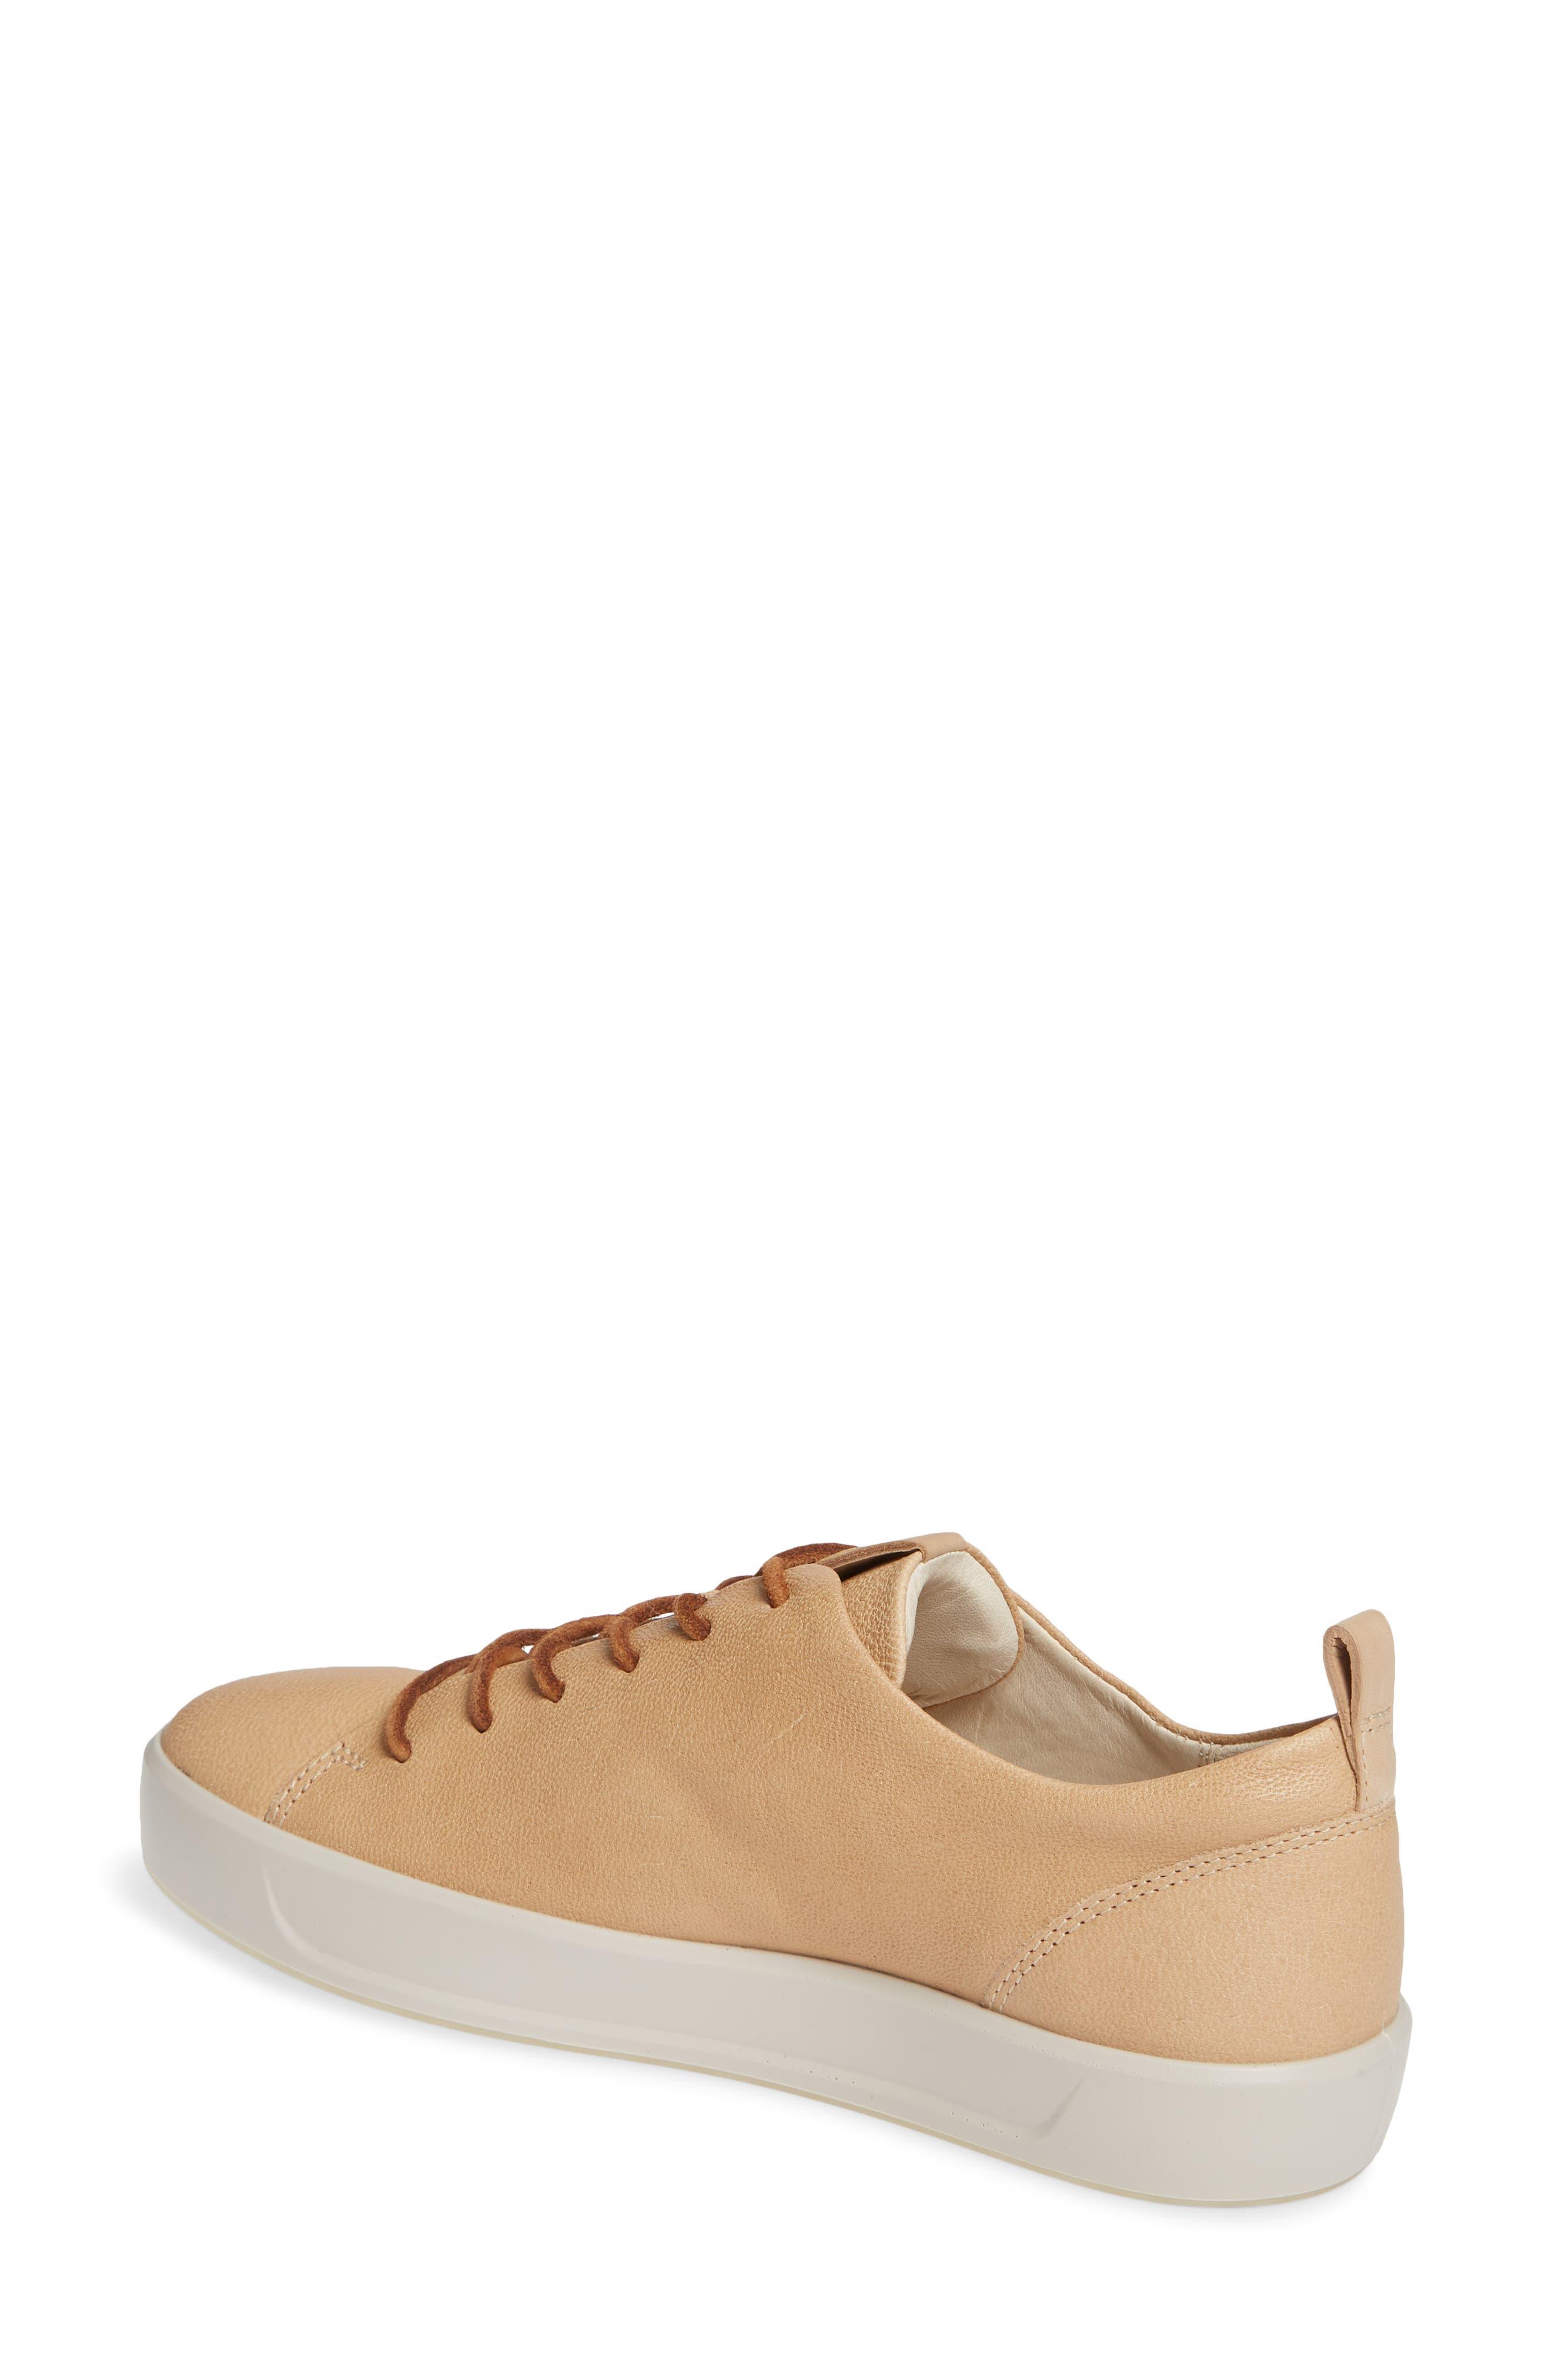 ECCO, Soft 8 Sneaker, Alternate thumbnail 2, color, POWDER LEATHER